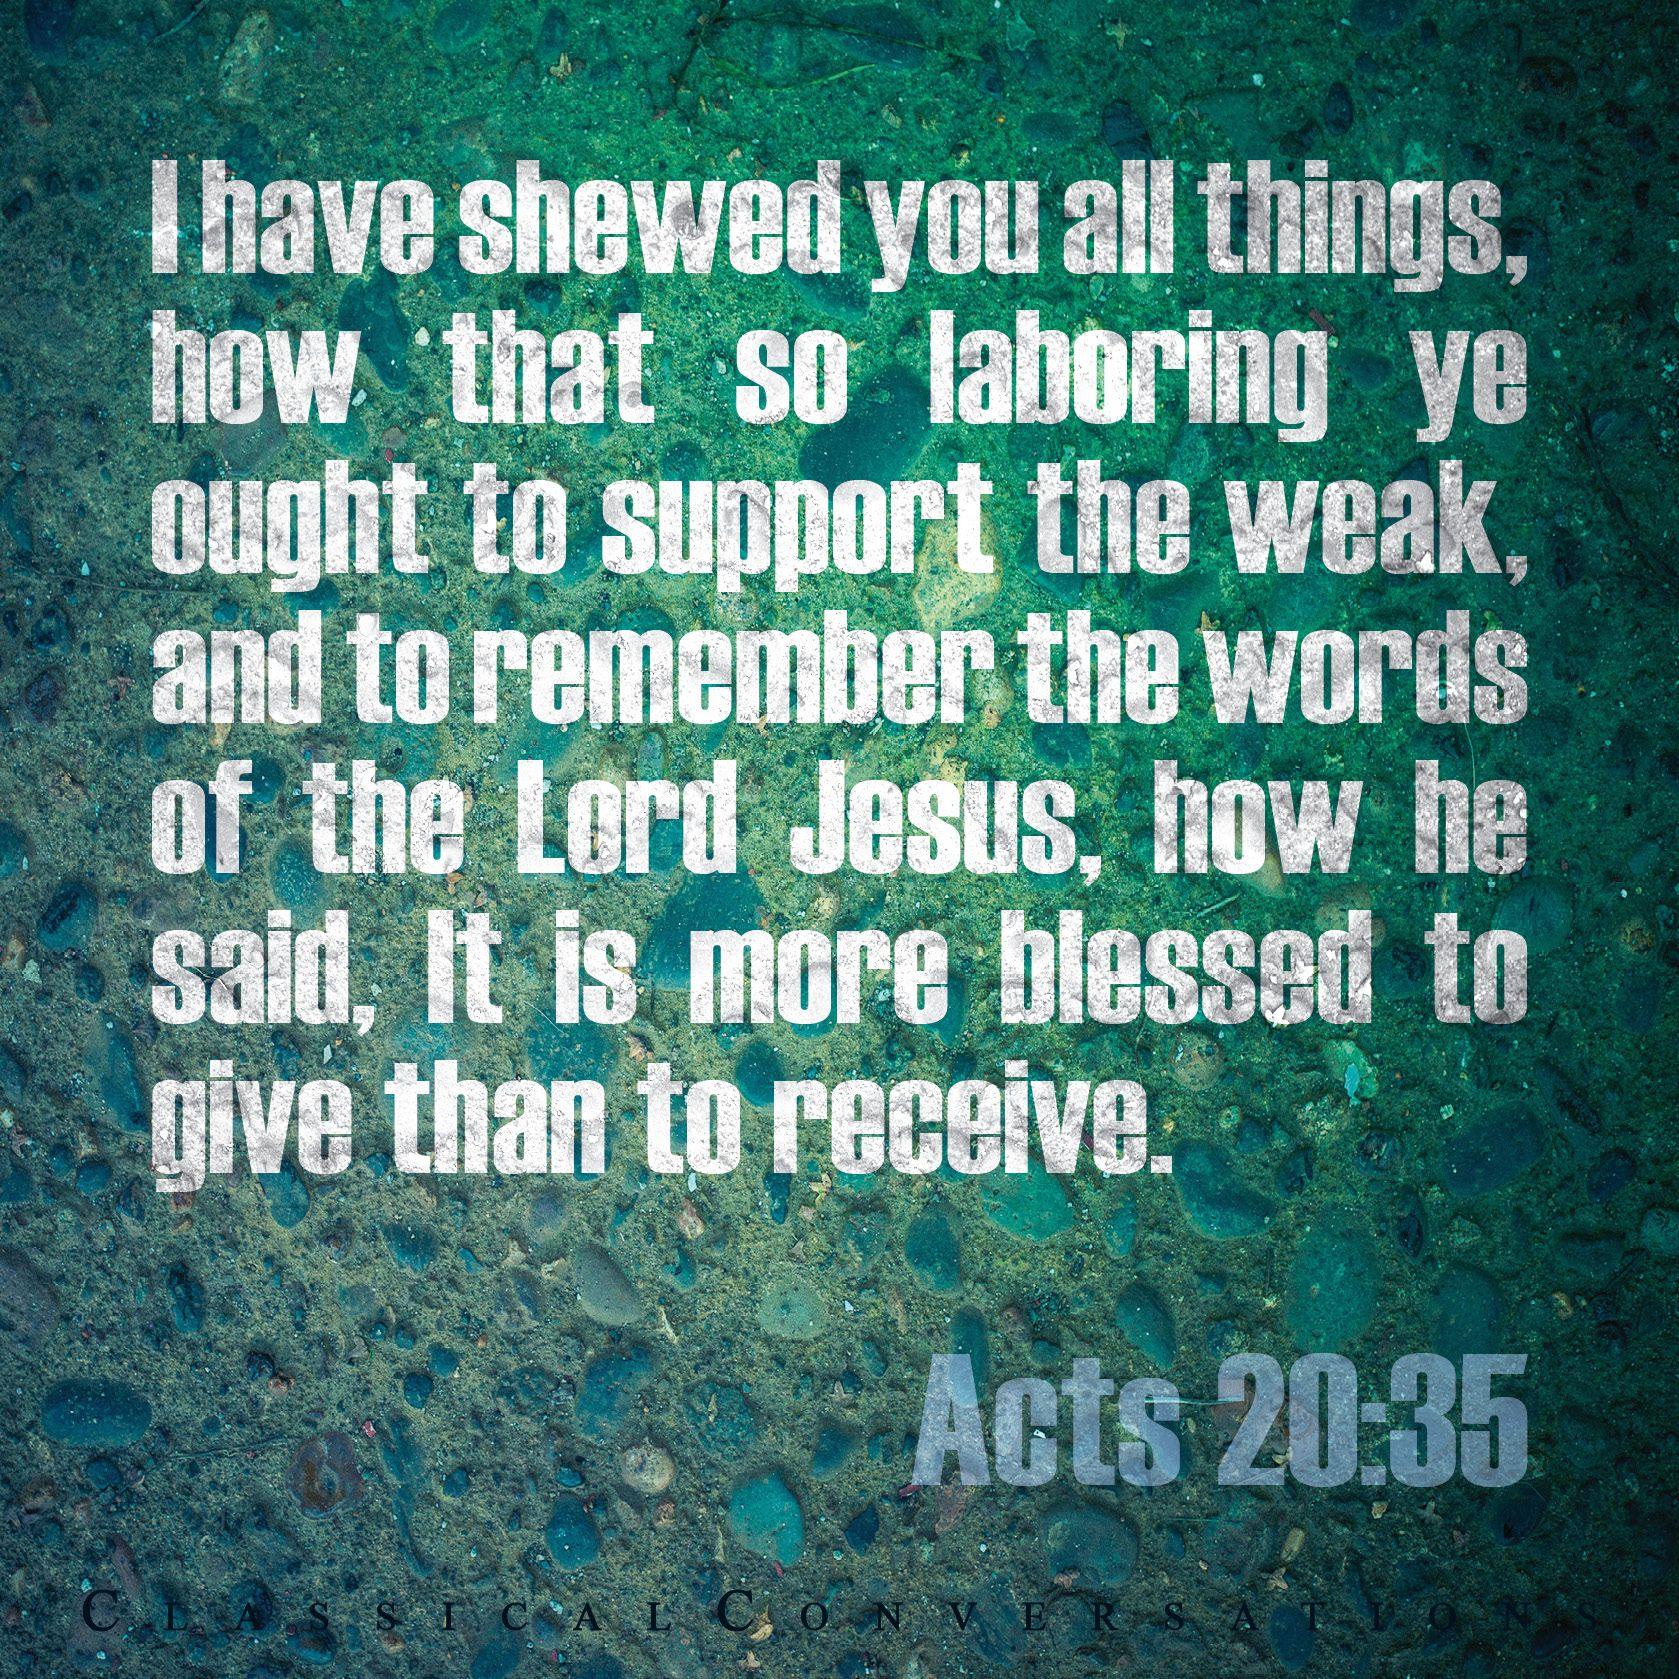 Acts 20:35 KJV | Bible Scriptures | Bible scriptures, King